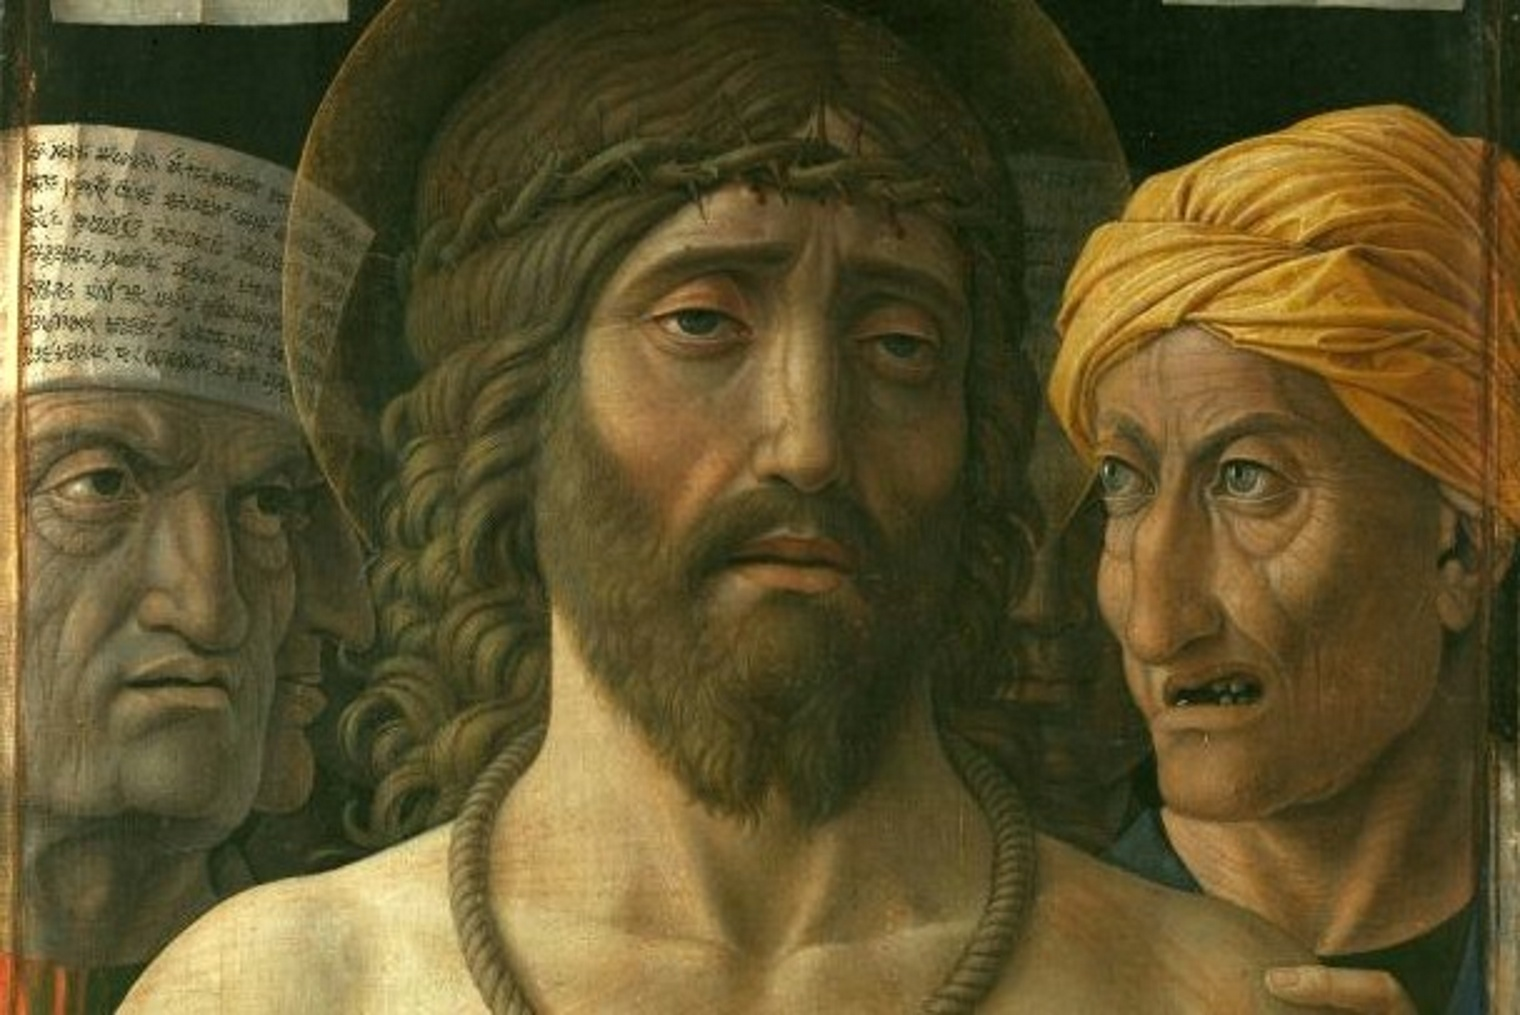 Andrea Mantegna, Ecce homo, 1500-1502 Tempera su tela di lino, Musée Jacquemart-André, Parigi (particolare)